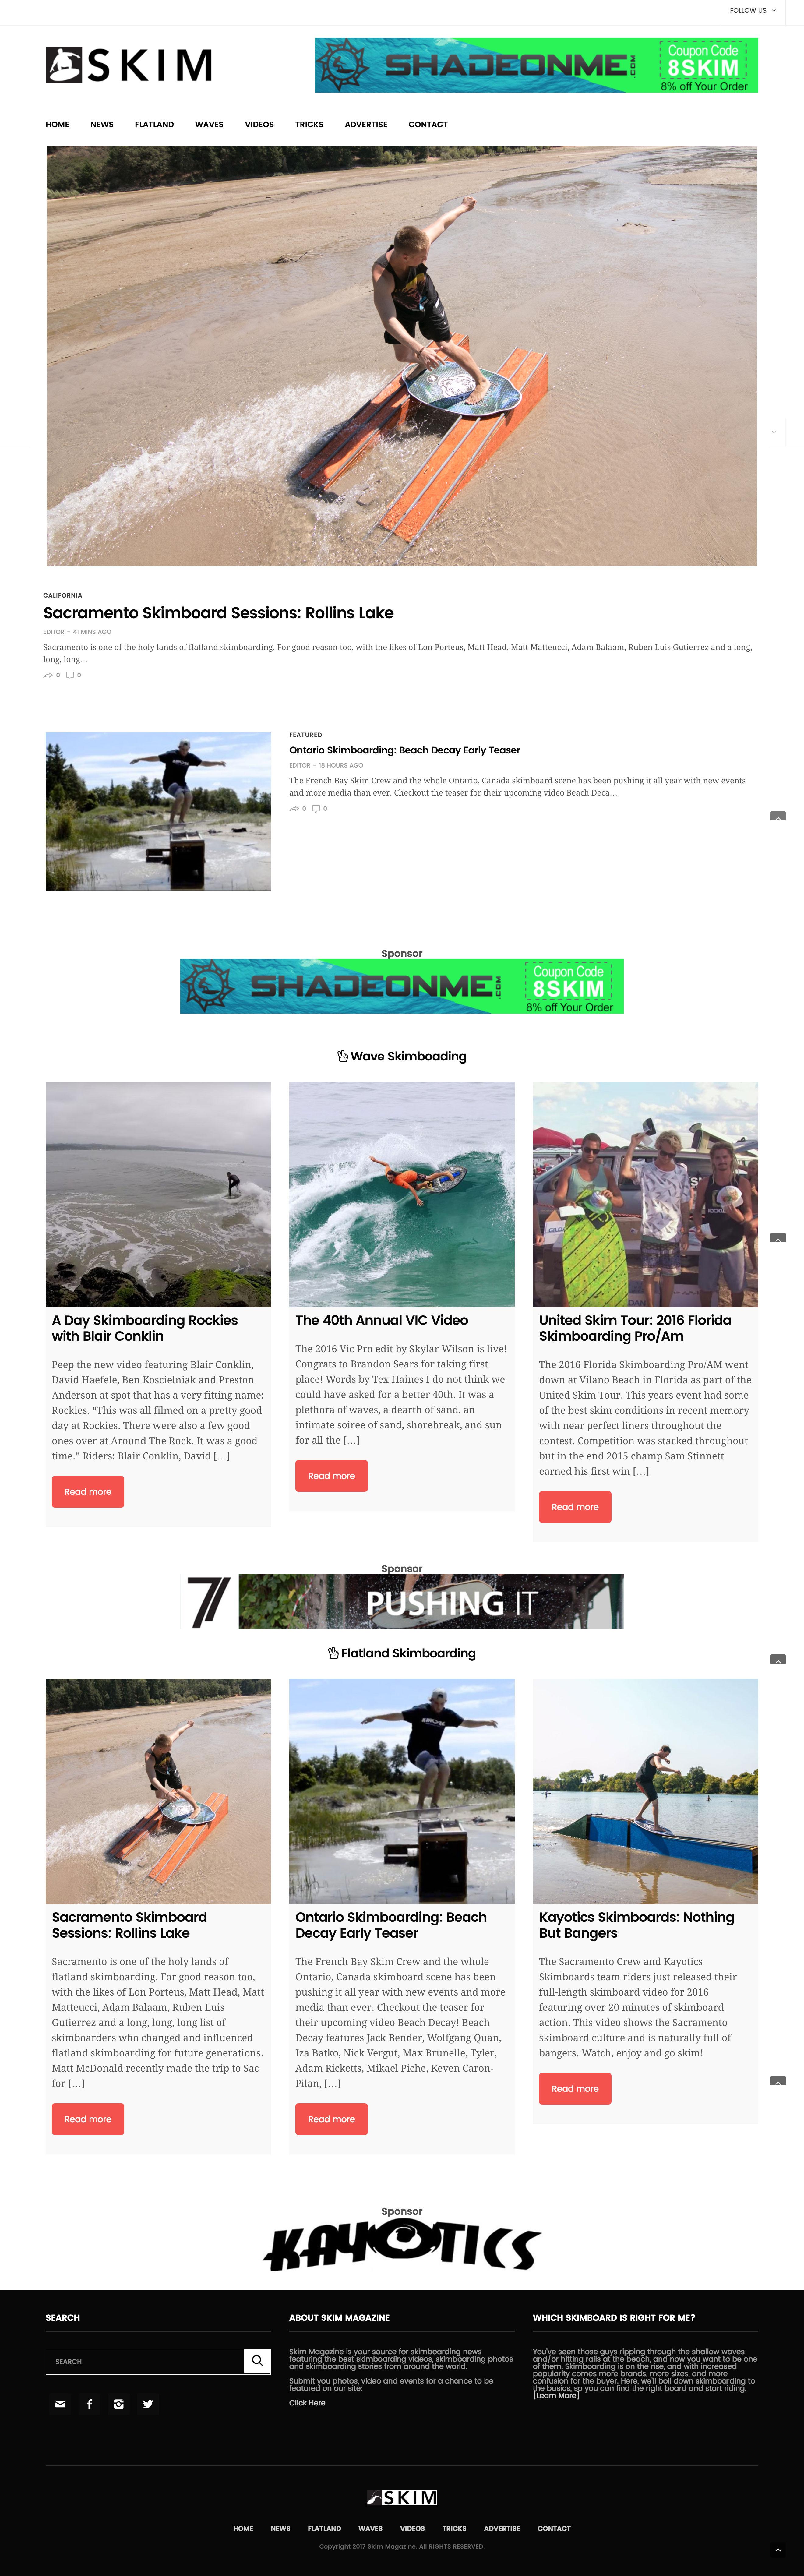 skim-magazine-home-page